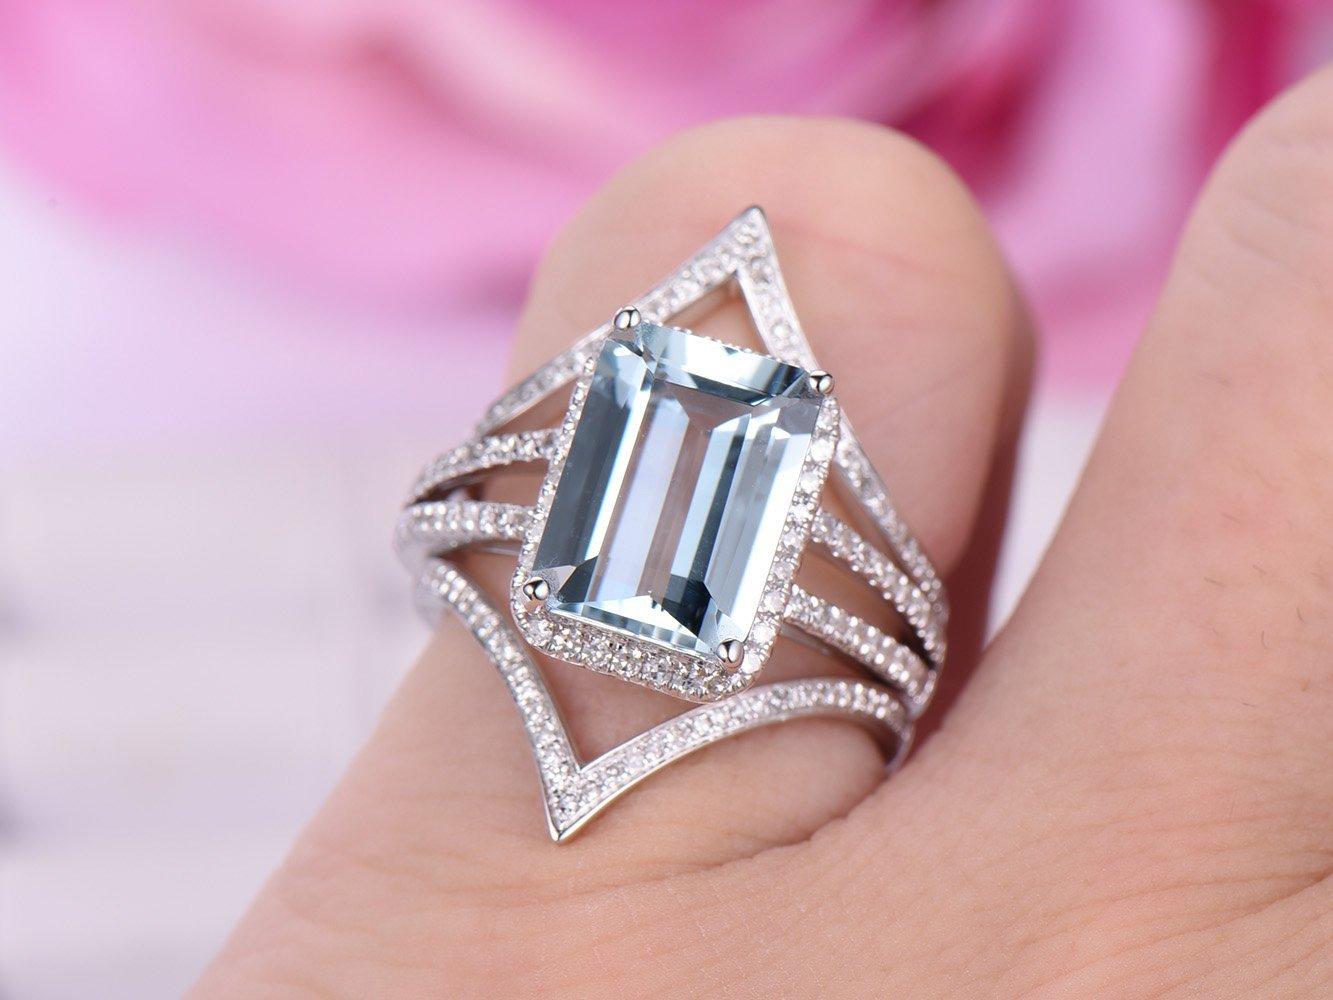 Amazon.com: Emerald Cut Aquamarine Engagement Ring Set Pave Diamond ...